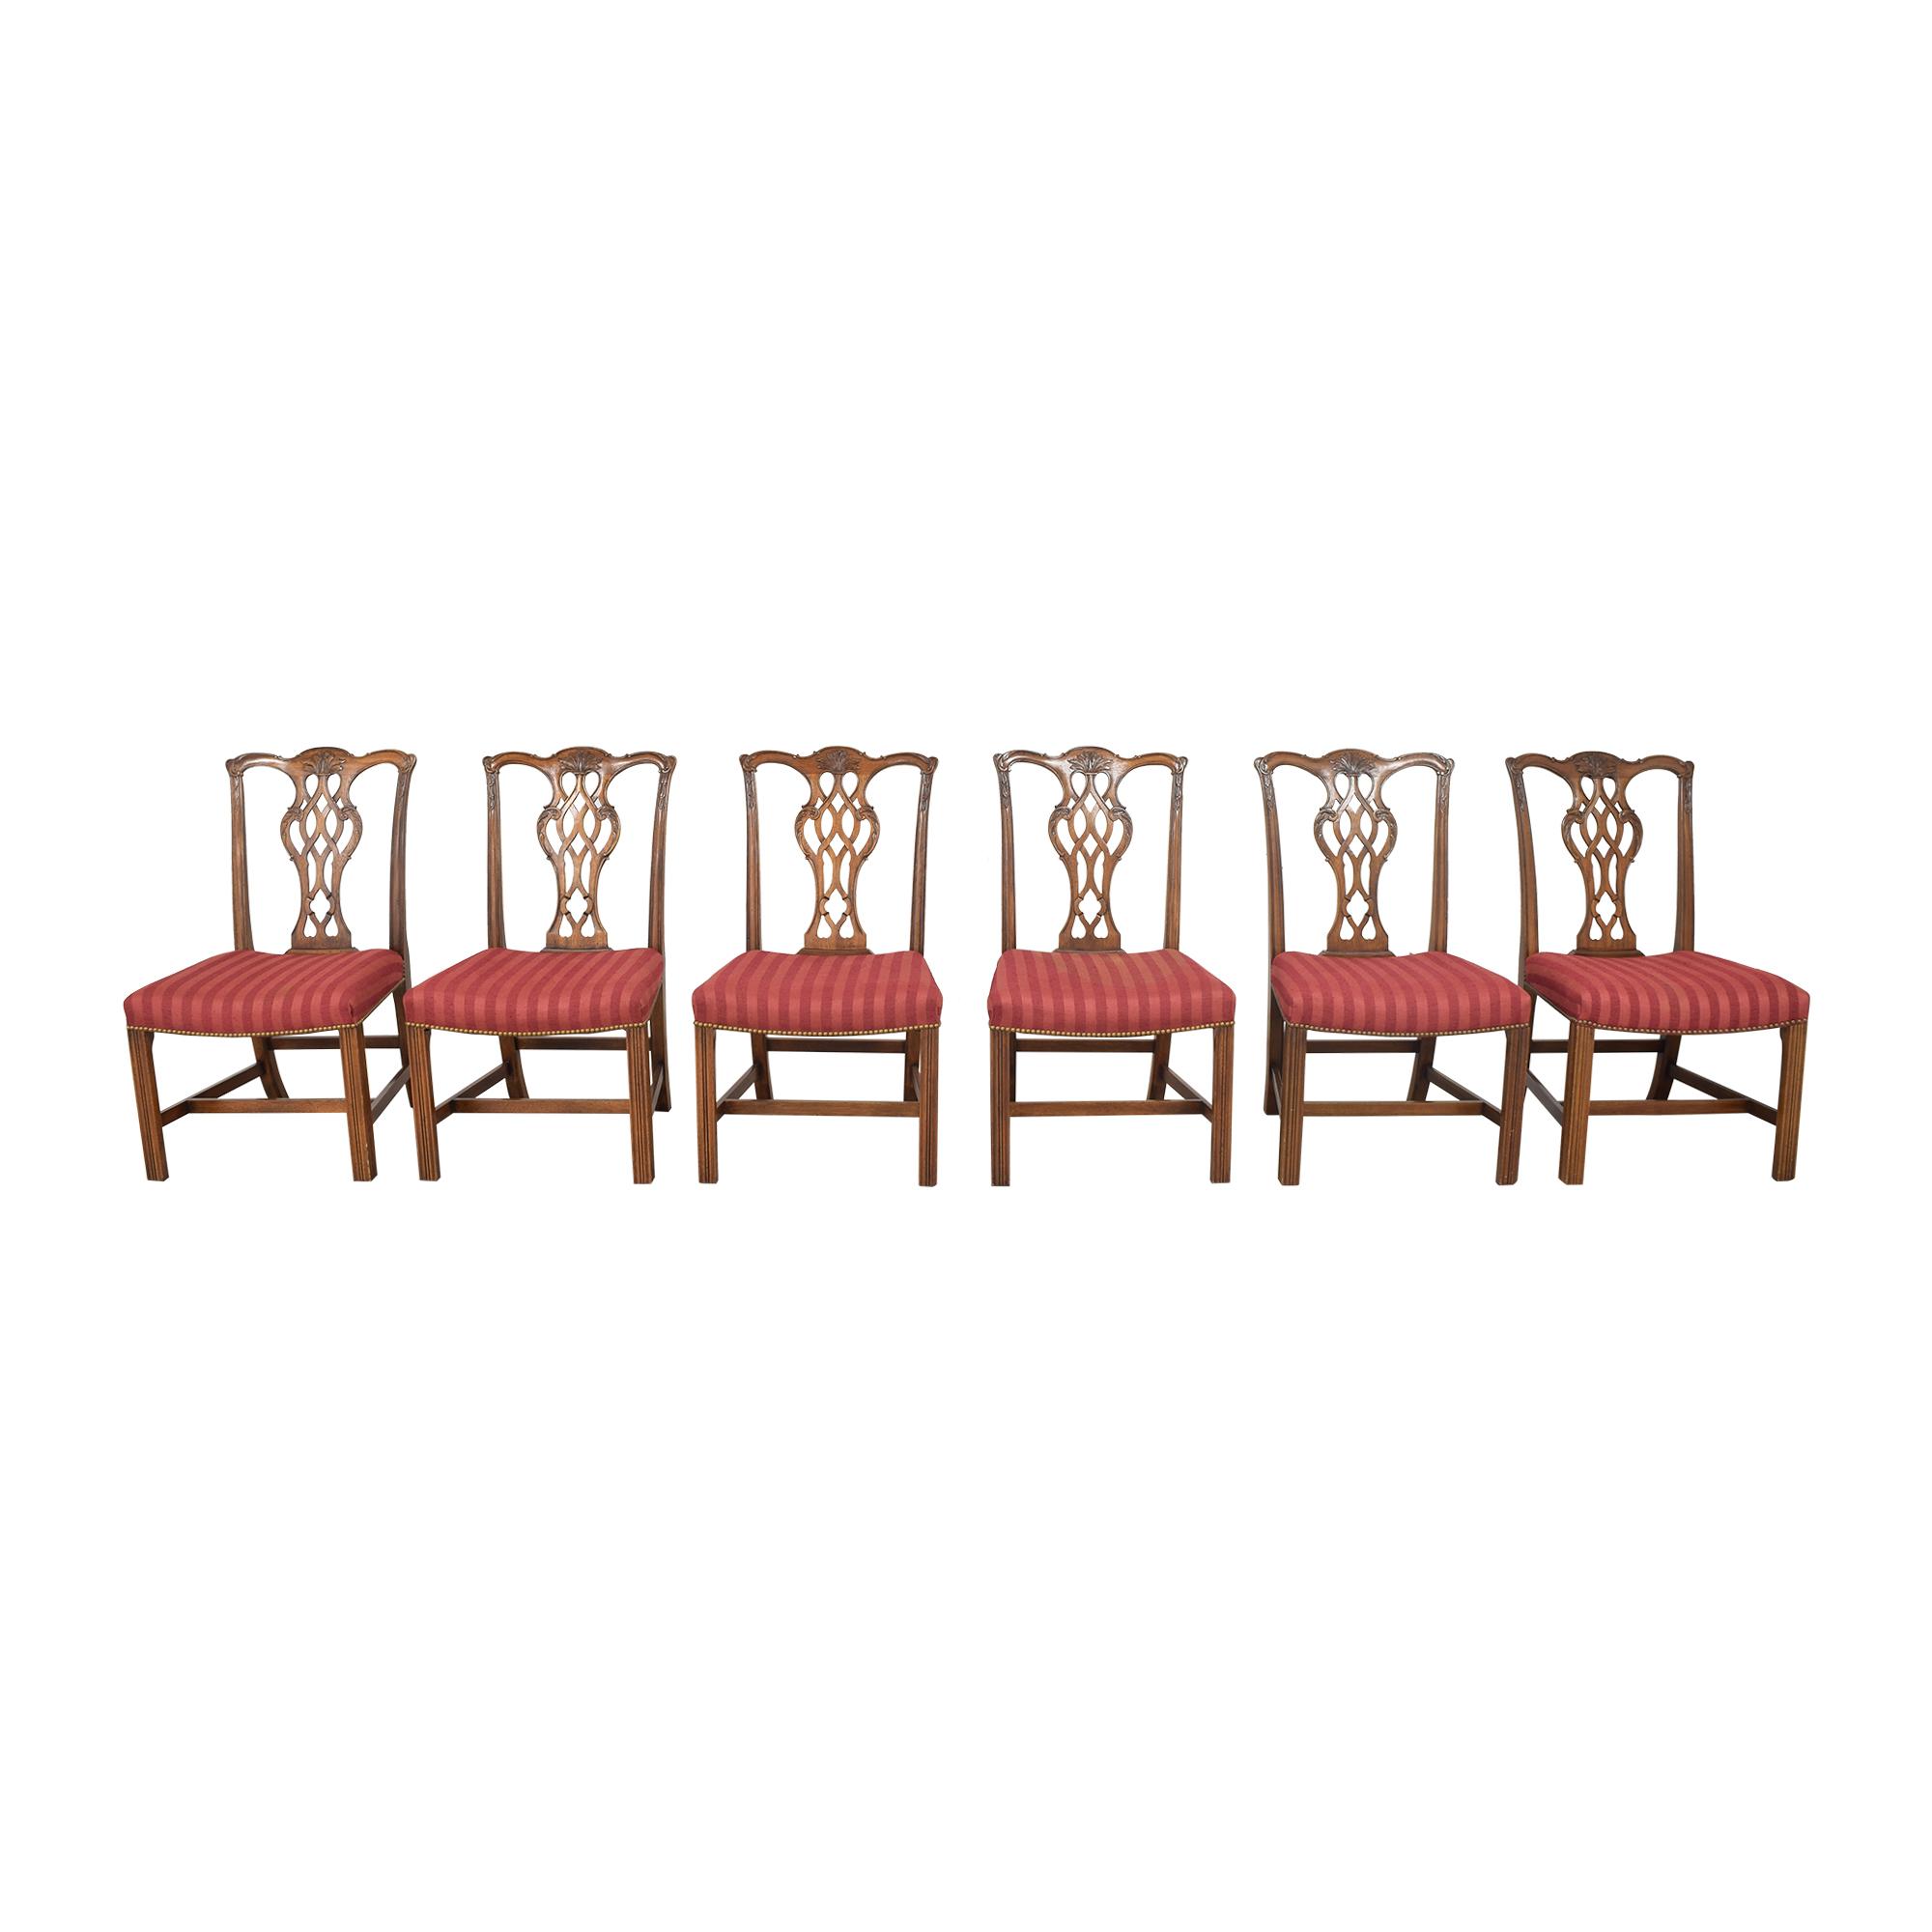 John Widdicomb Co. John Widdicomb Co. Chippendale Style Dining chairs ma